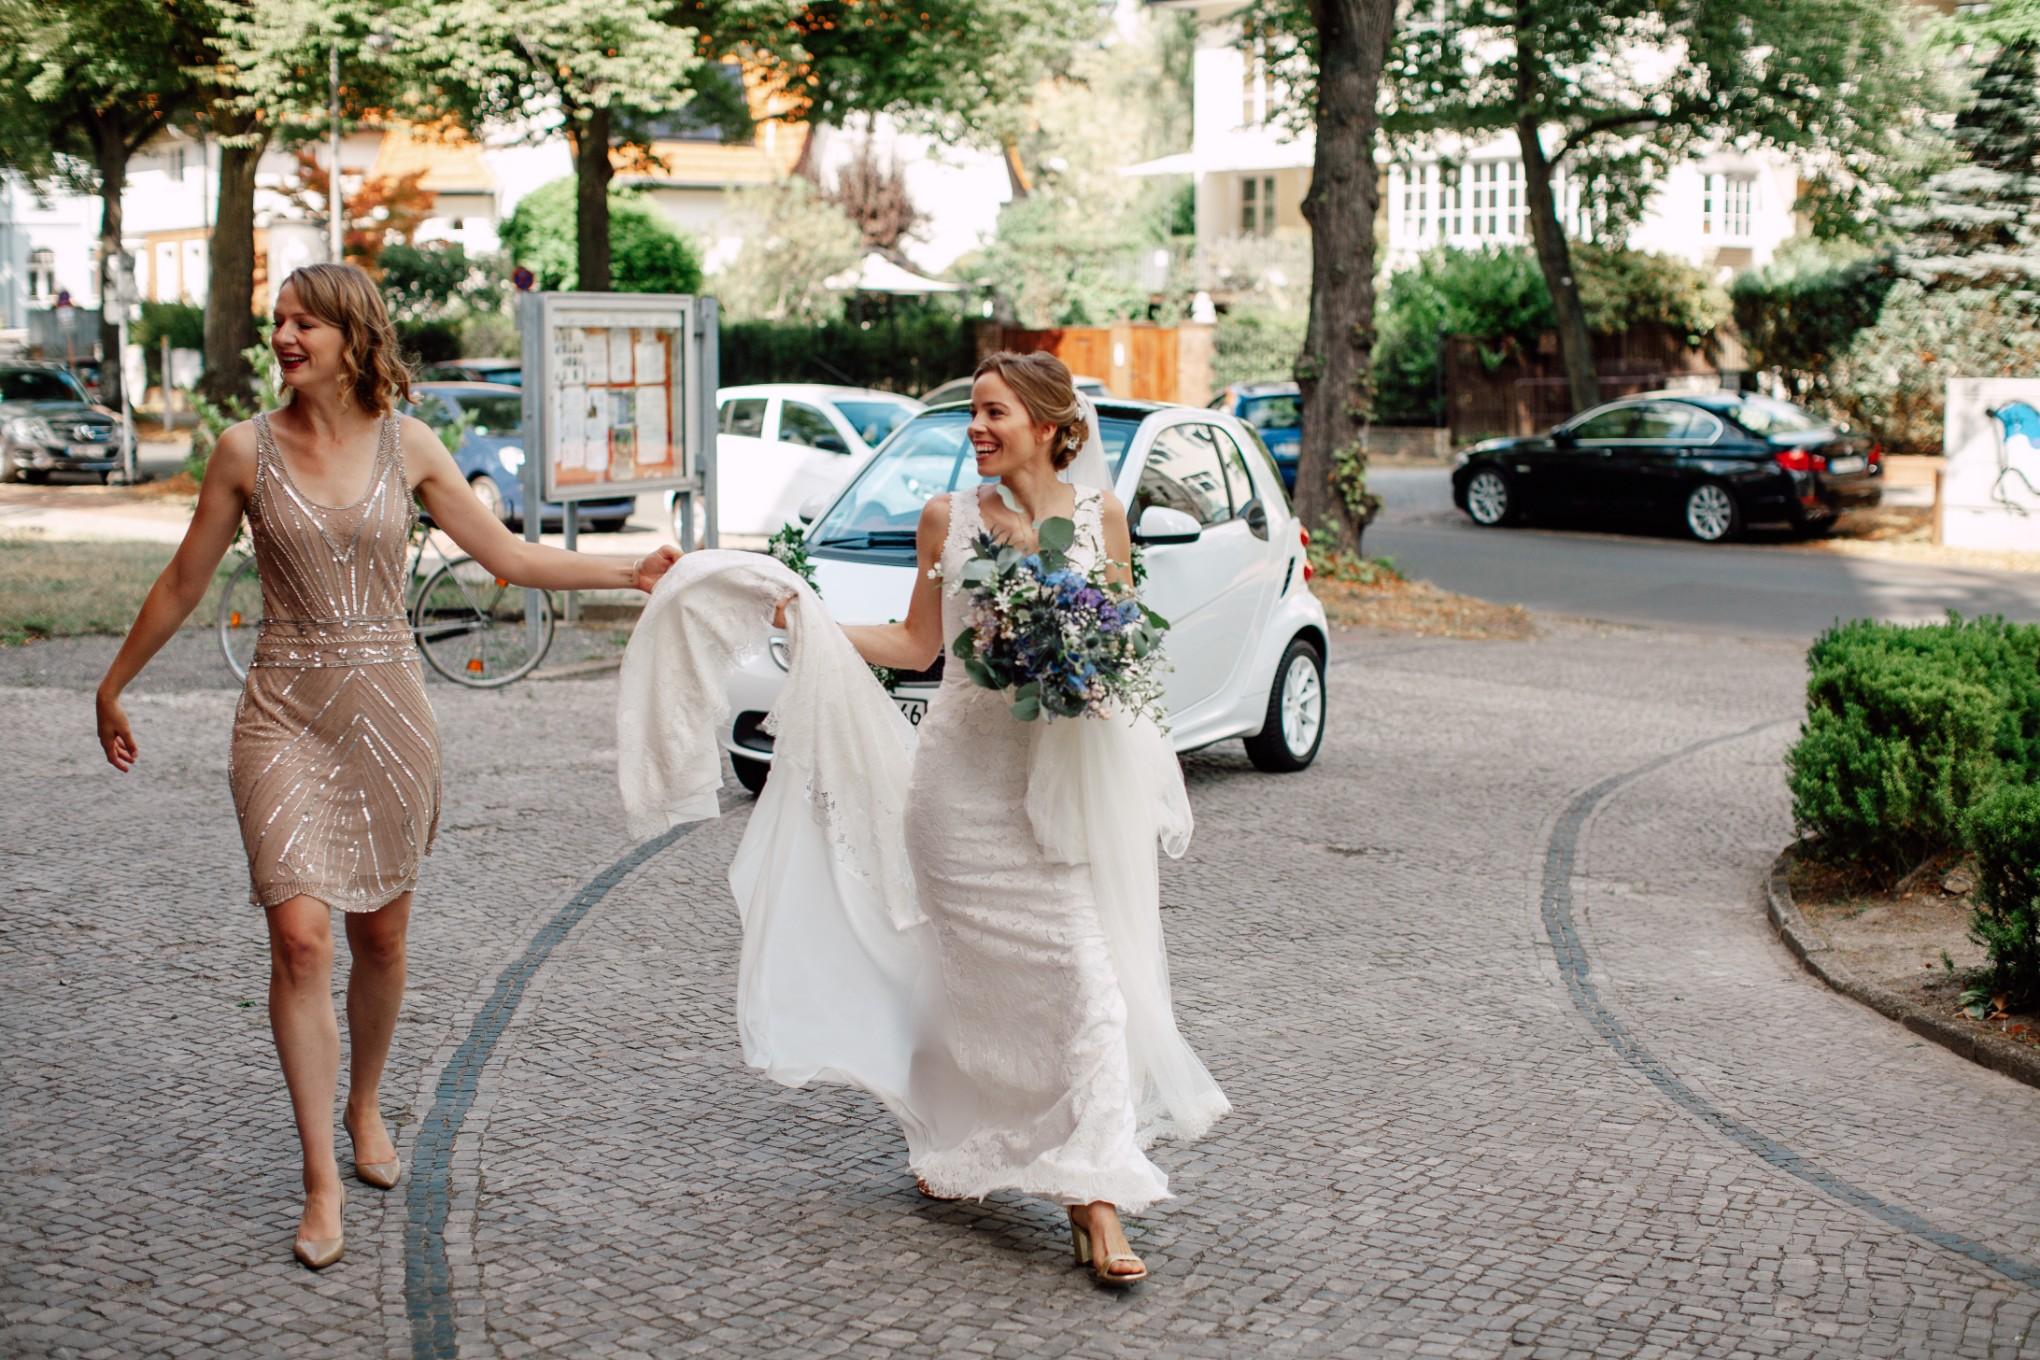 Berlin-Wannsee-Pia-Anna-Christian-Wedding-Photography-ST-6.jpg